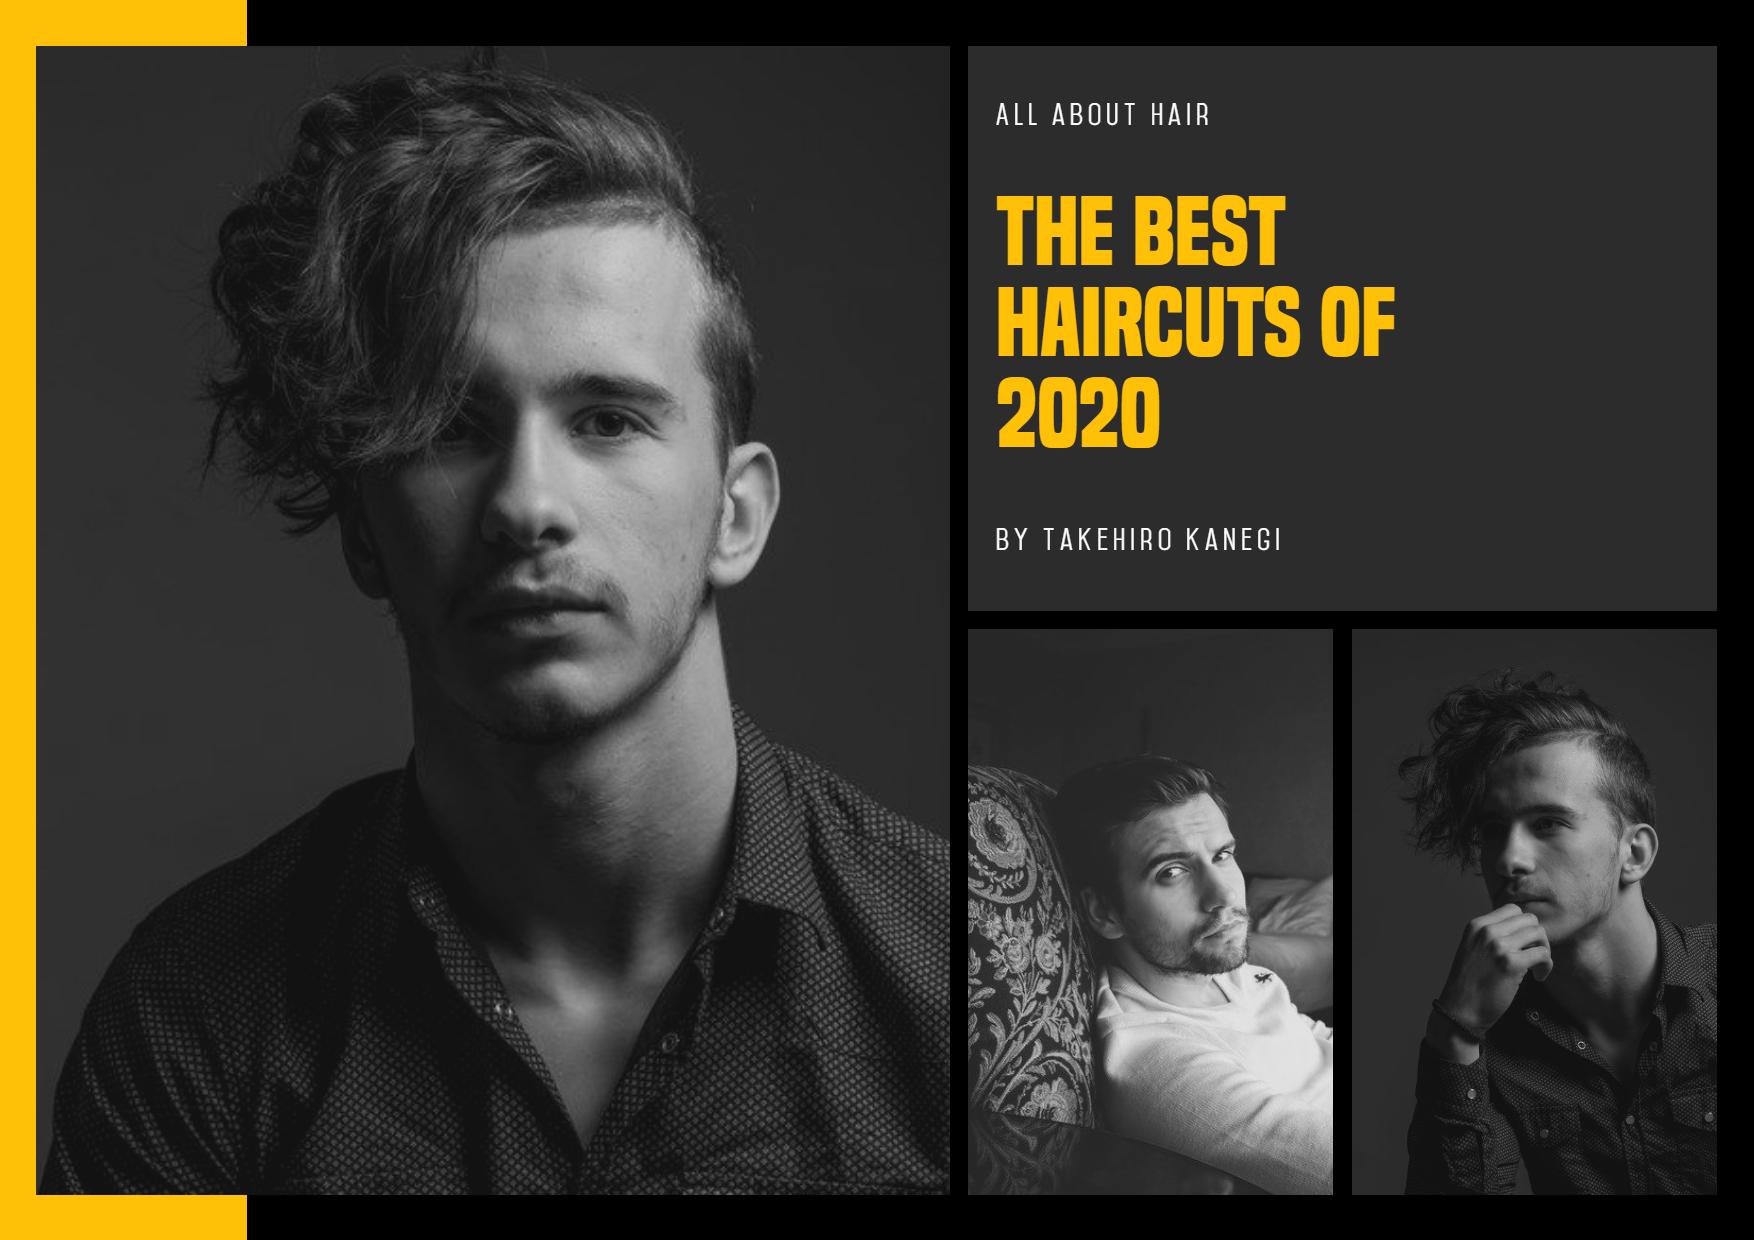 Custom Men's Grooming Photo Collage Design  Template